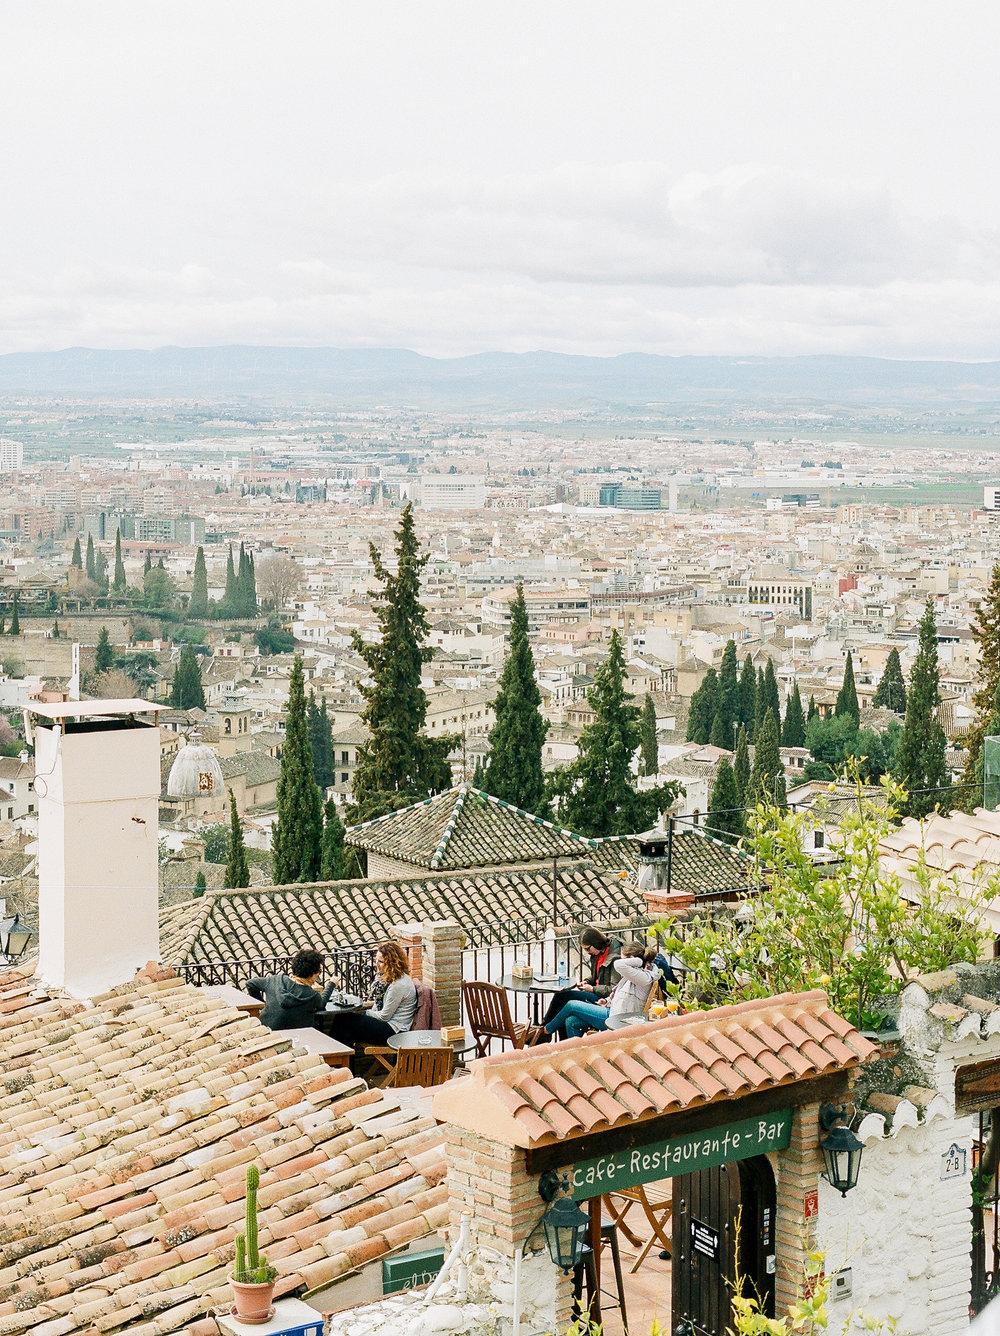 Destination-Europe-Travel-Film-Photographer-161.jpg